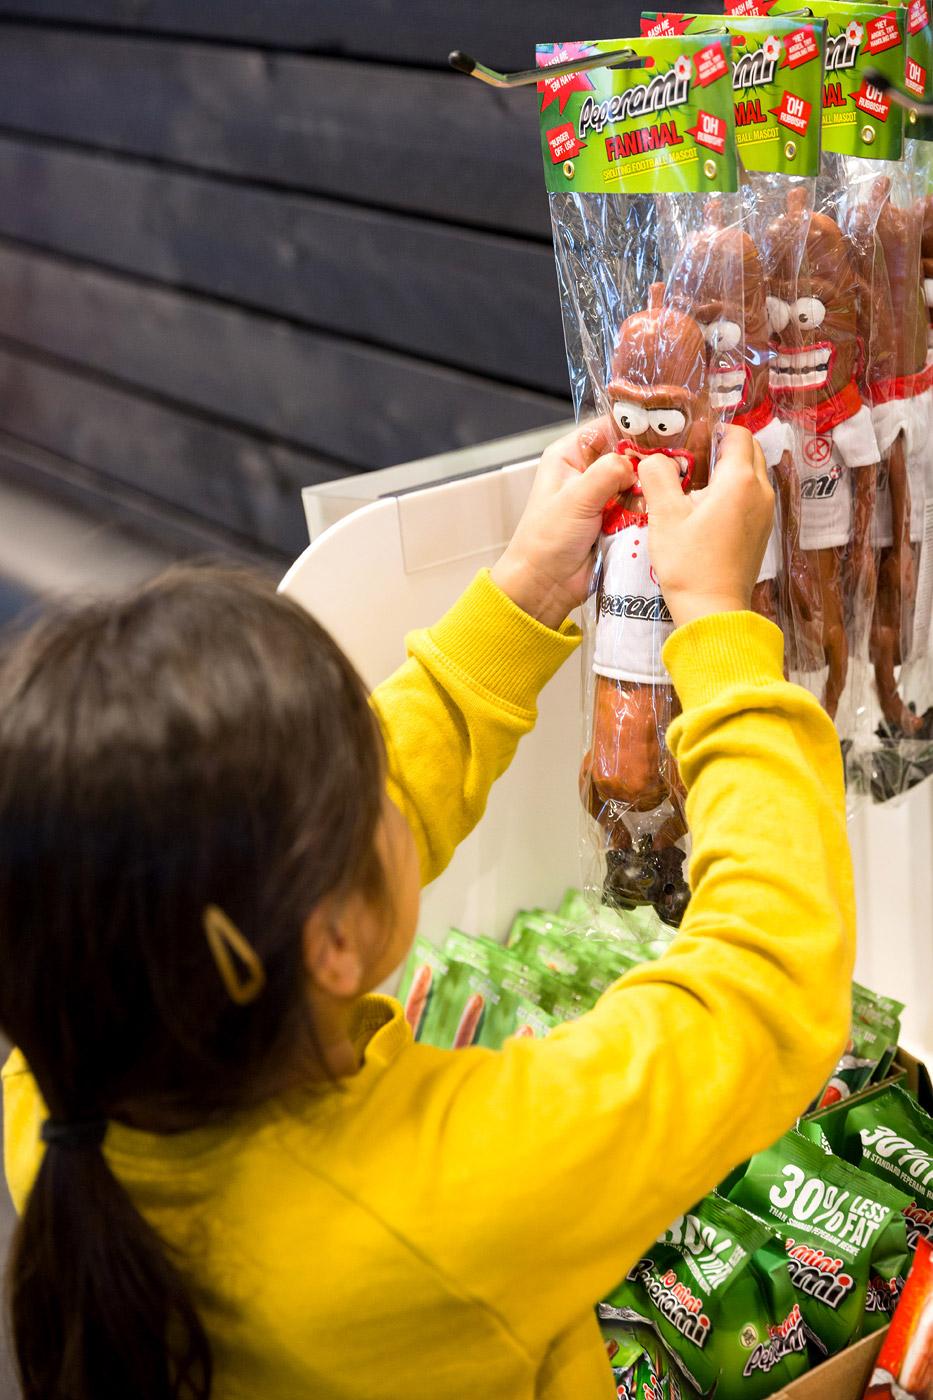 jacklinks-bifi-peperami-amsterdam-feest-receptie-hoofdkantoor-opening-kid-animal